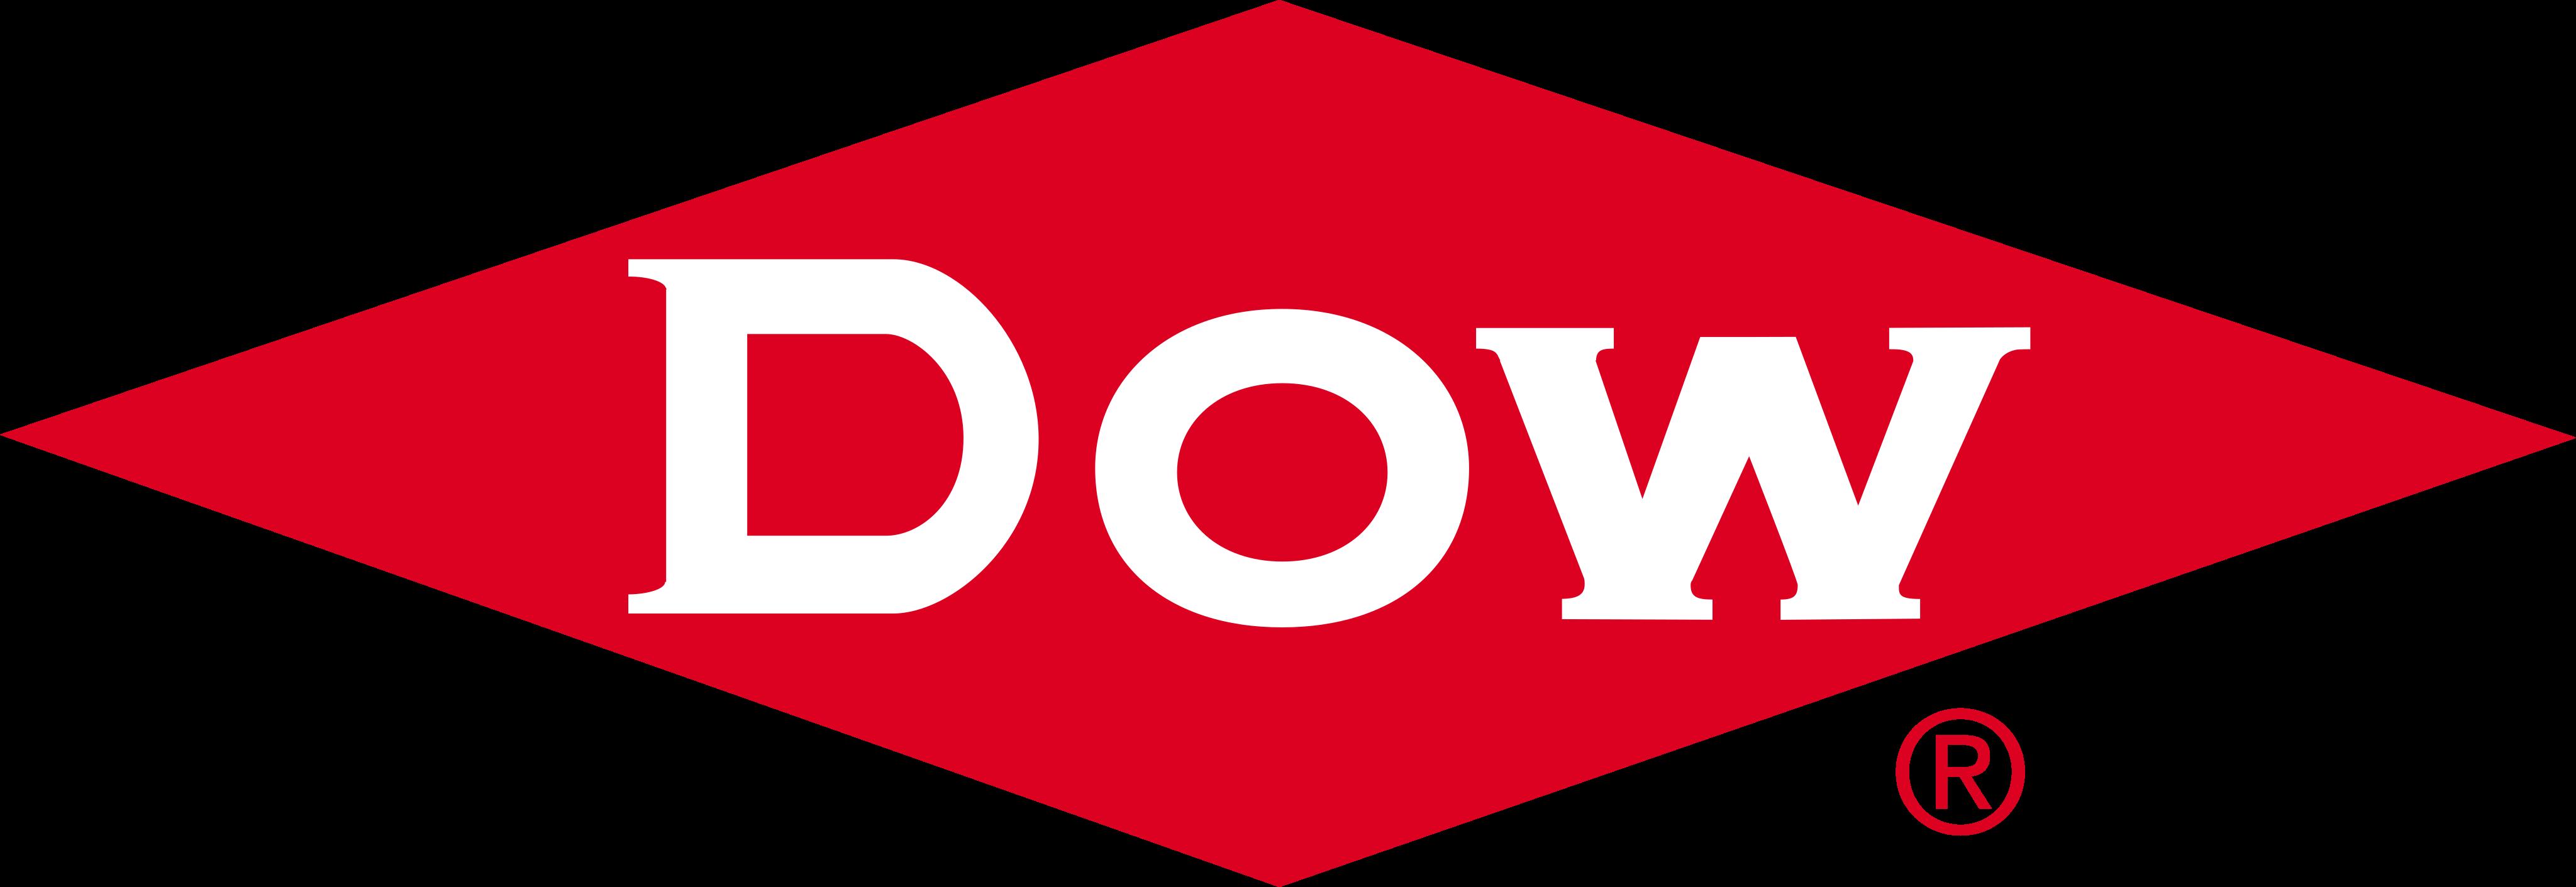 dow-chemical-logo